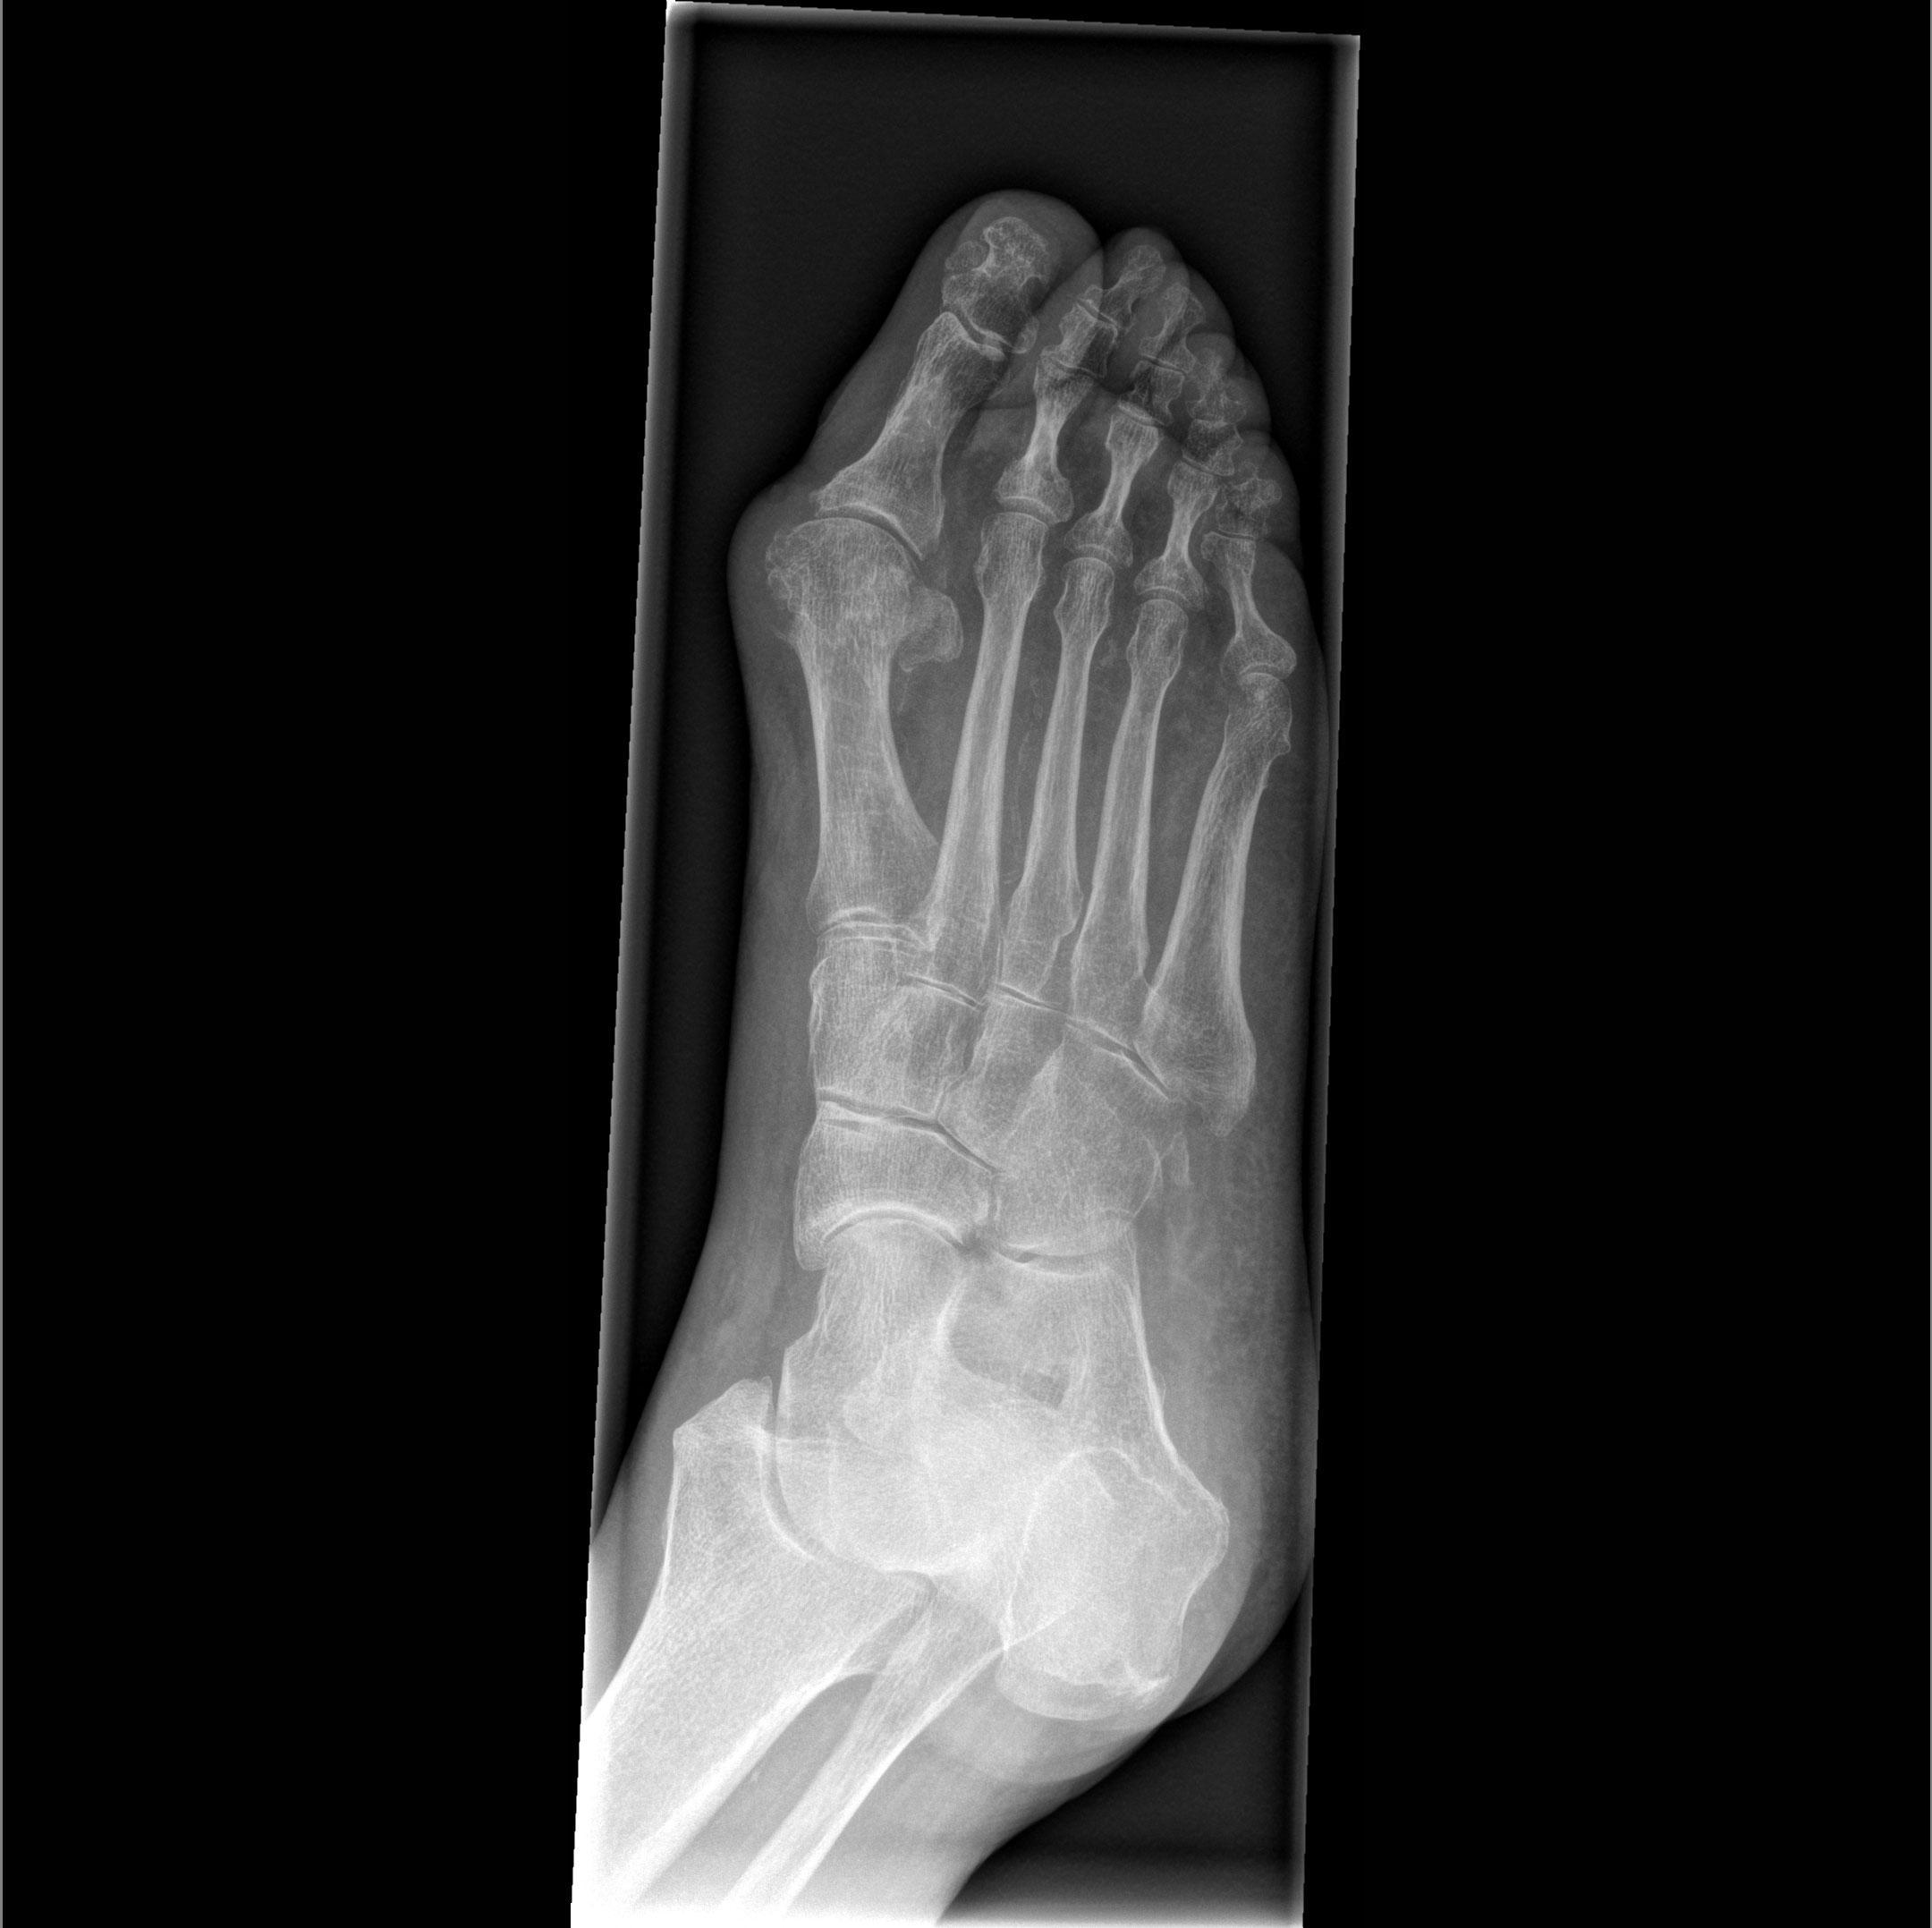 Mobilett Mira Max Foot II oblique Image